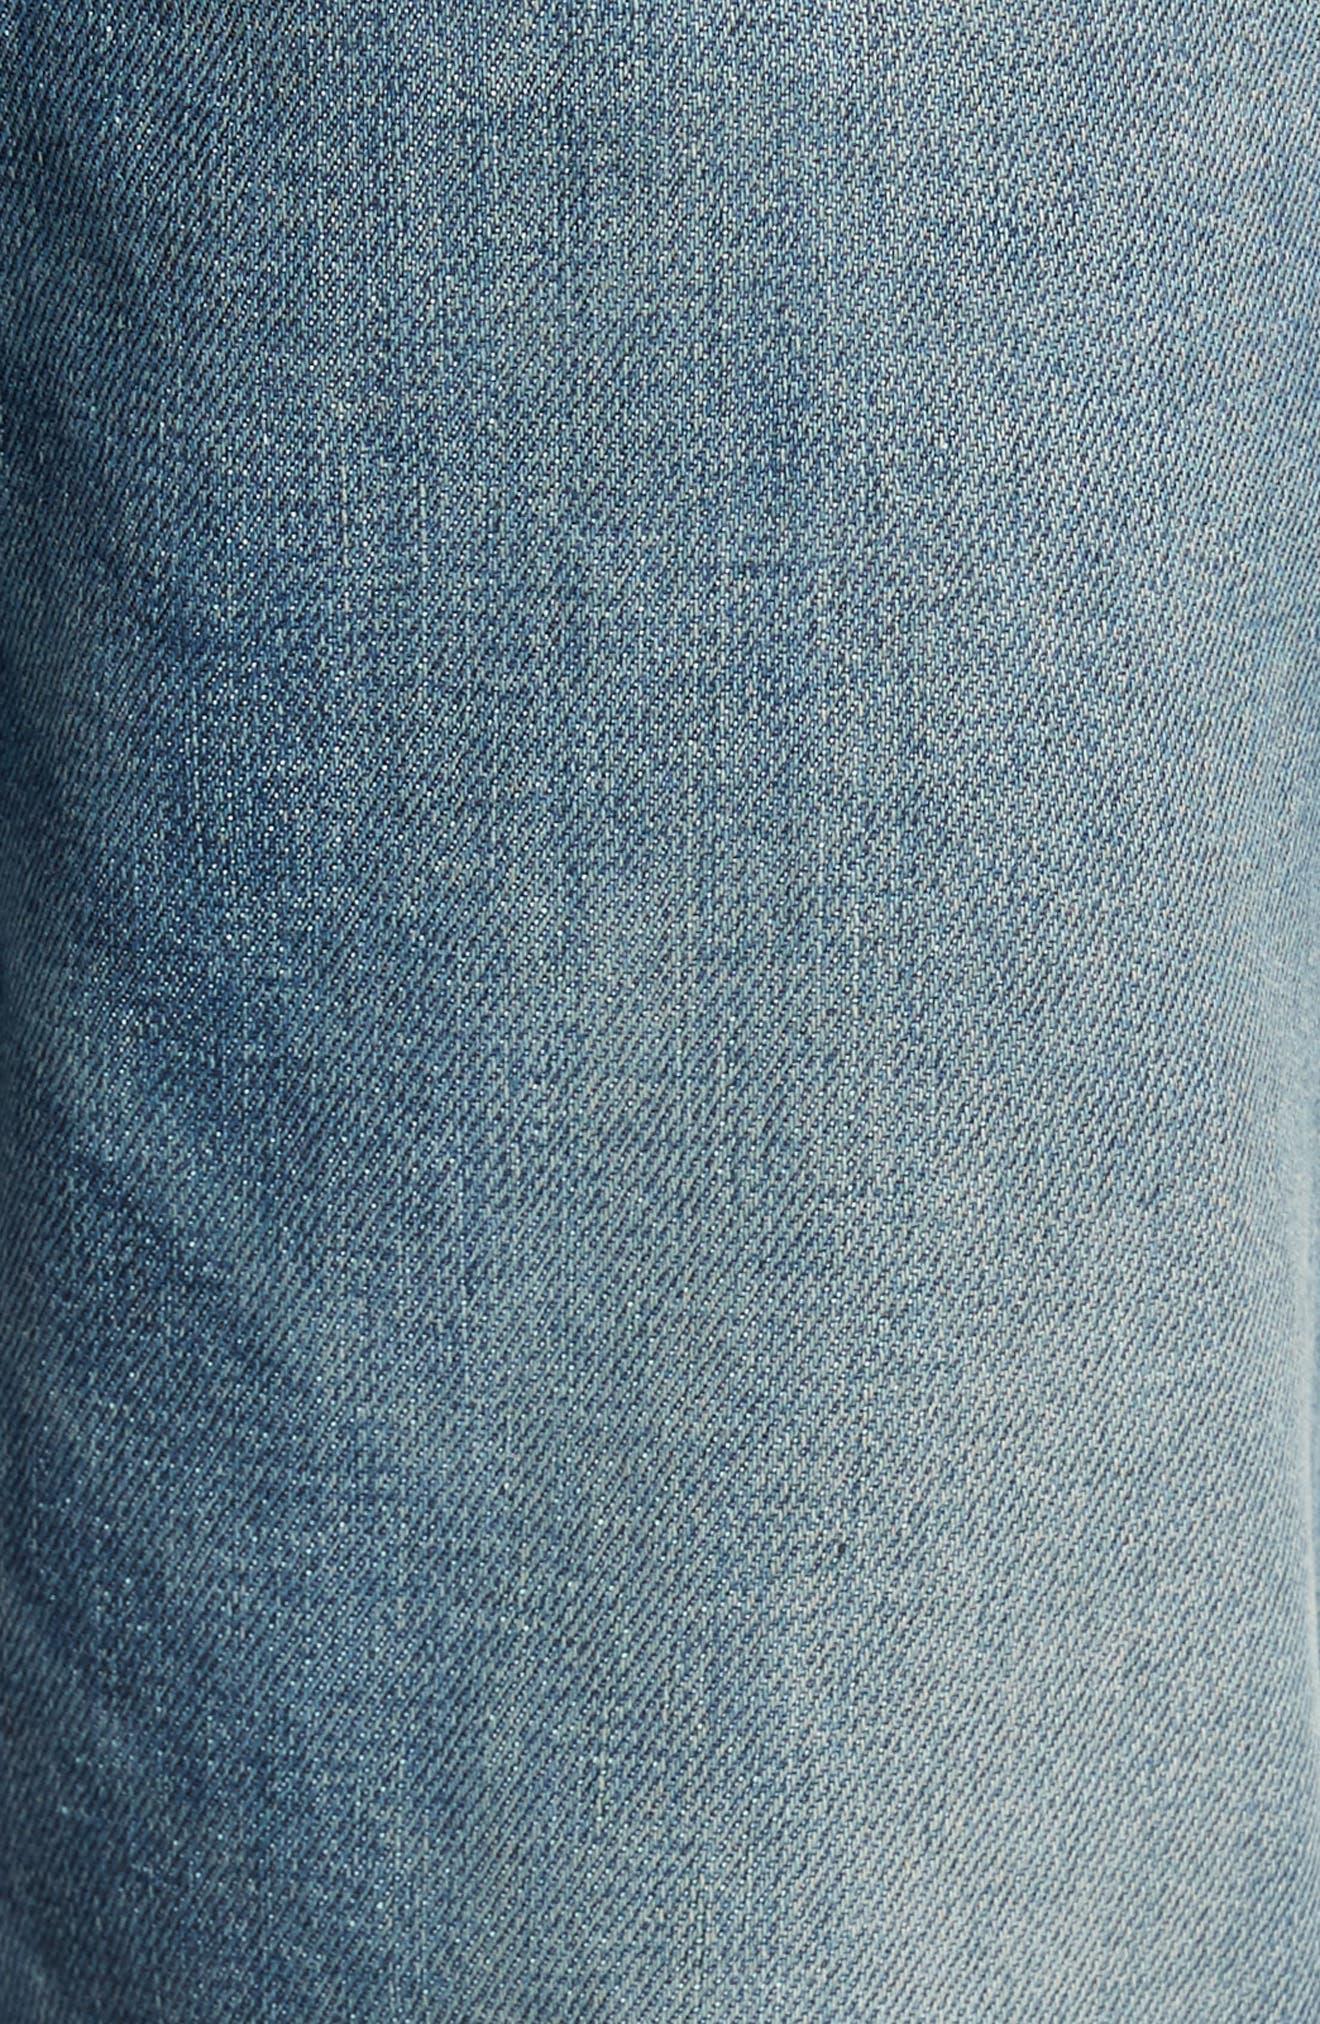 Blake Slim Fit Jeans,                             Alternate thumbnail 3, color,